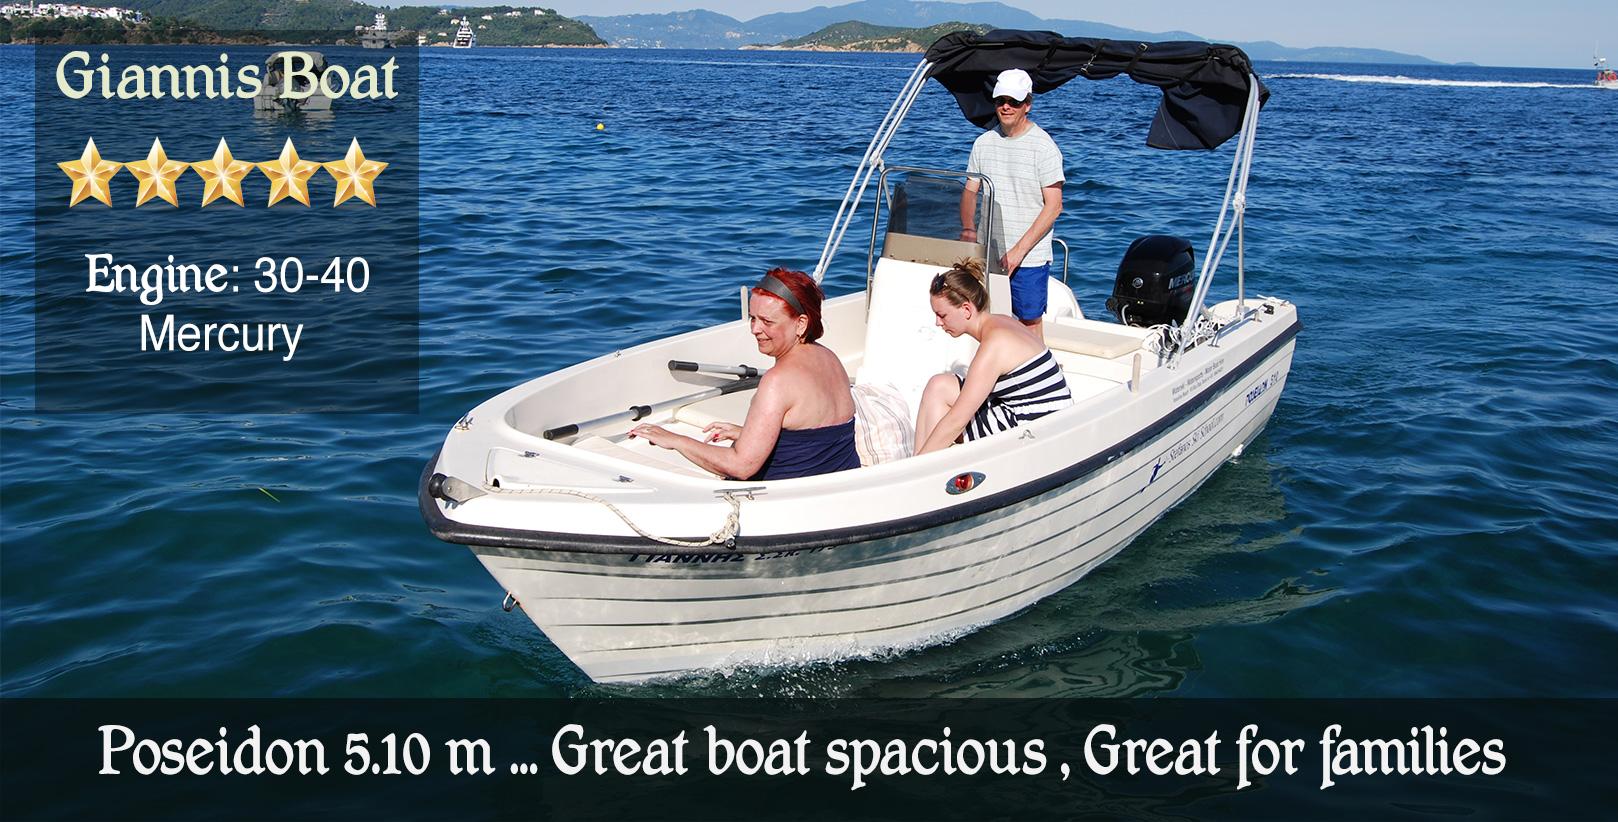 Giannis Boat